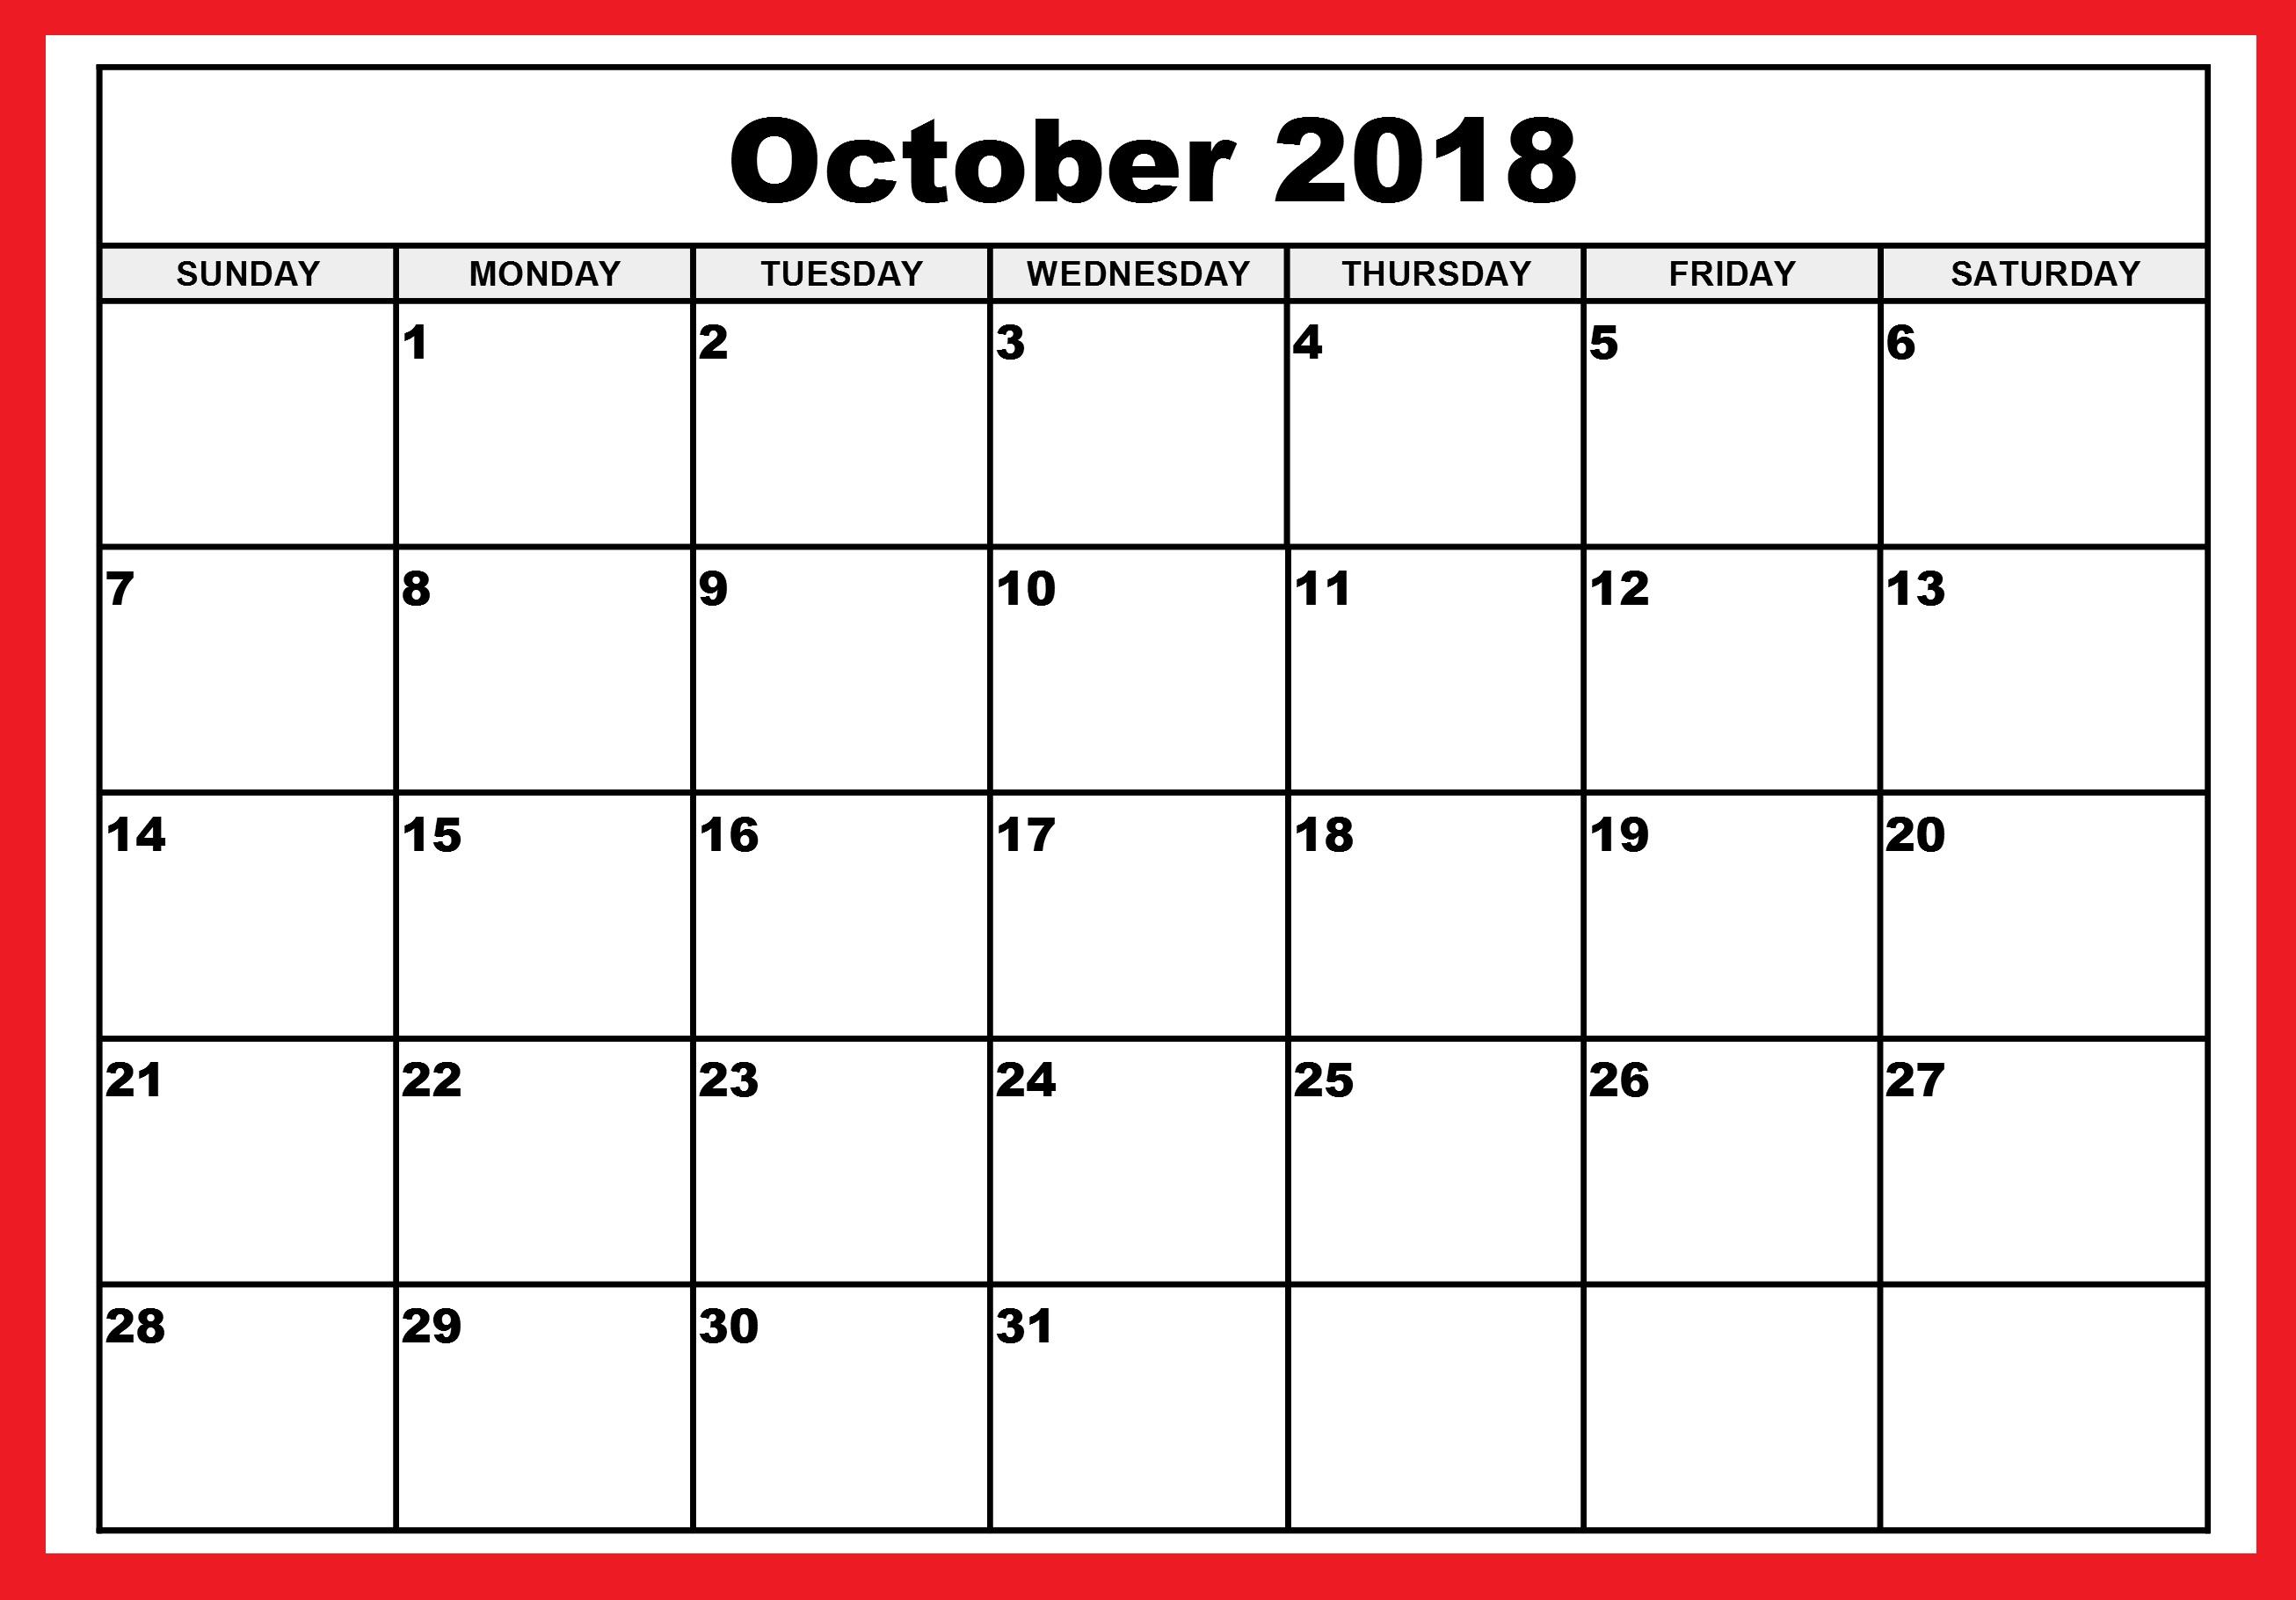 Blank October 2018 Calendar Printable Template Pdf inside October Calendar Printable Template